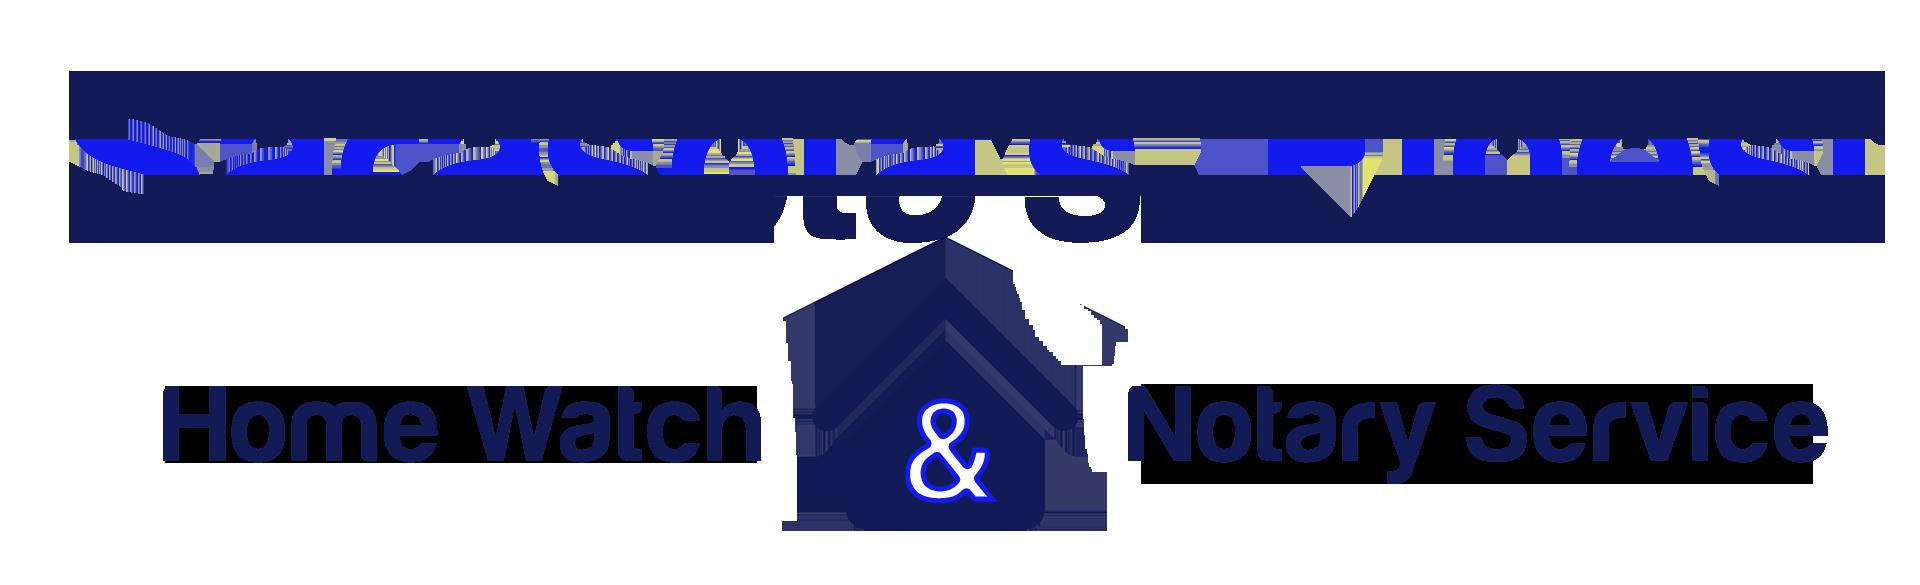 Home Watch